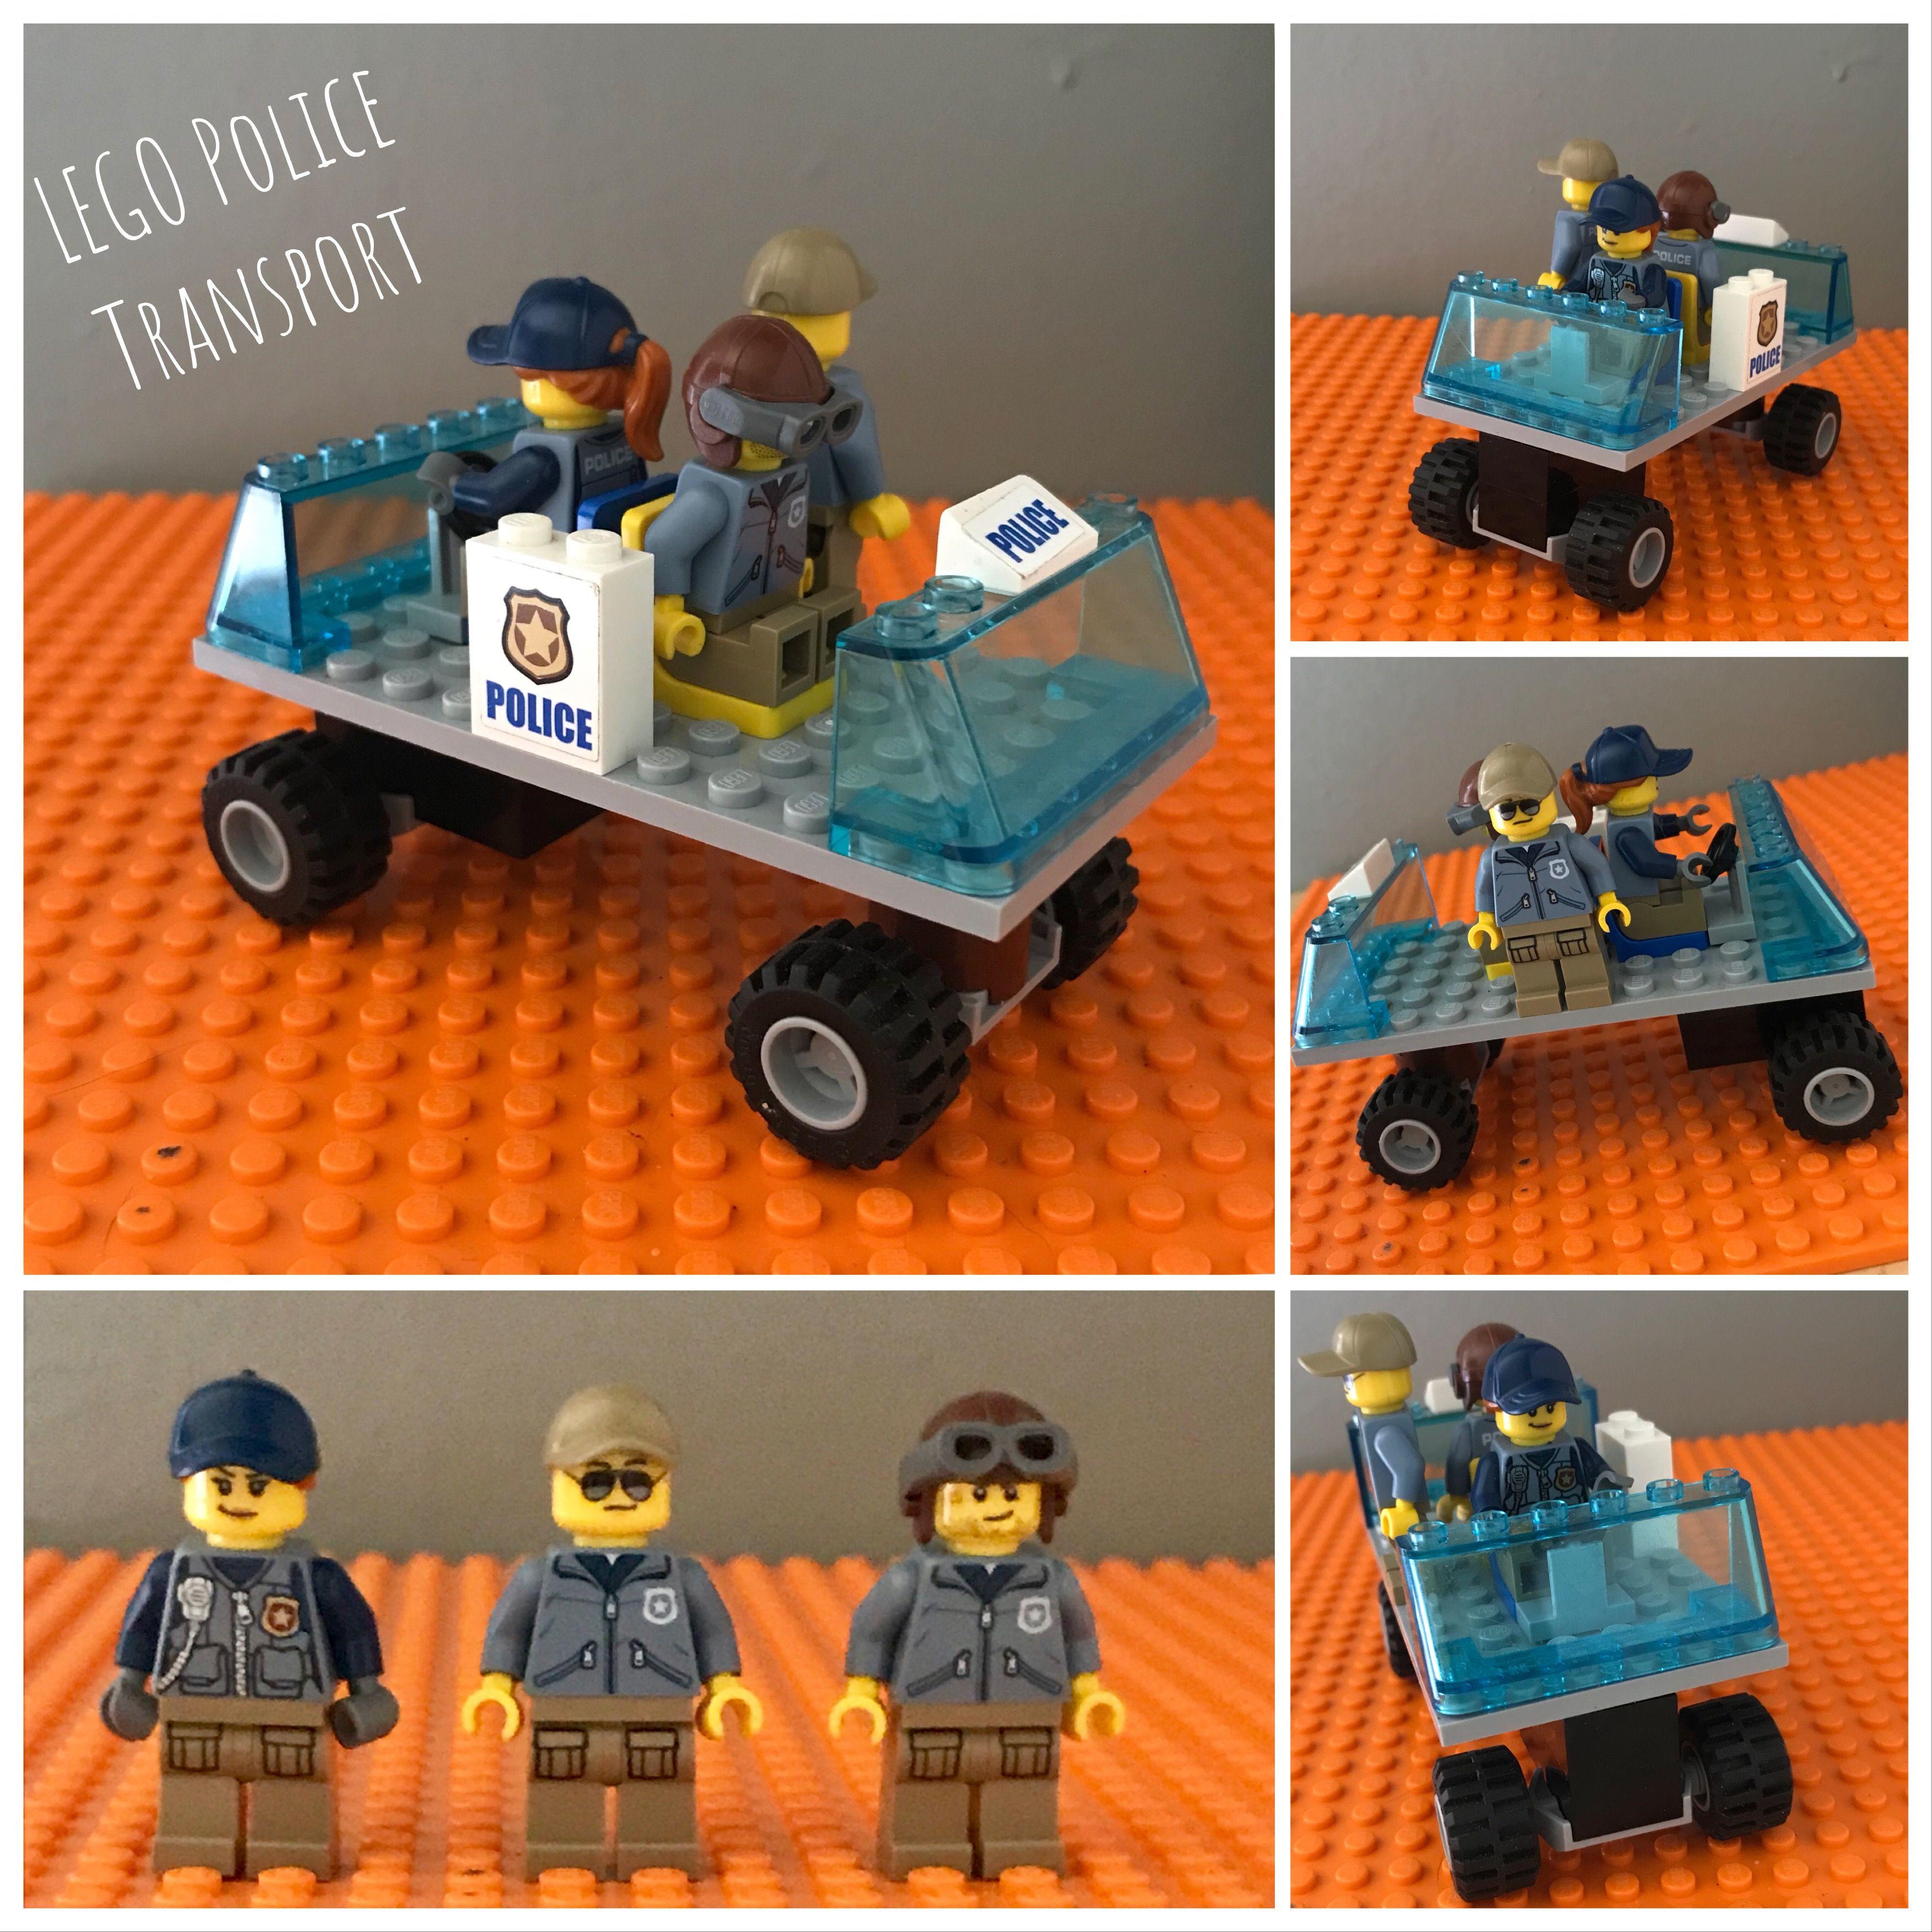 Lego City Police Transport Griffens Legos Griffenslegos Legocity Legotruck Lego Legopolice Legopolicetruck Lego City Police Lego Truck Lego Police Truck